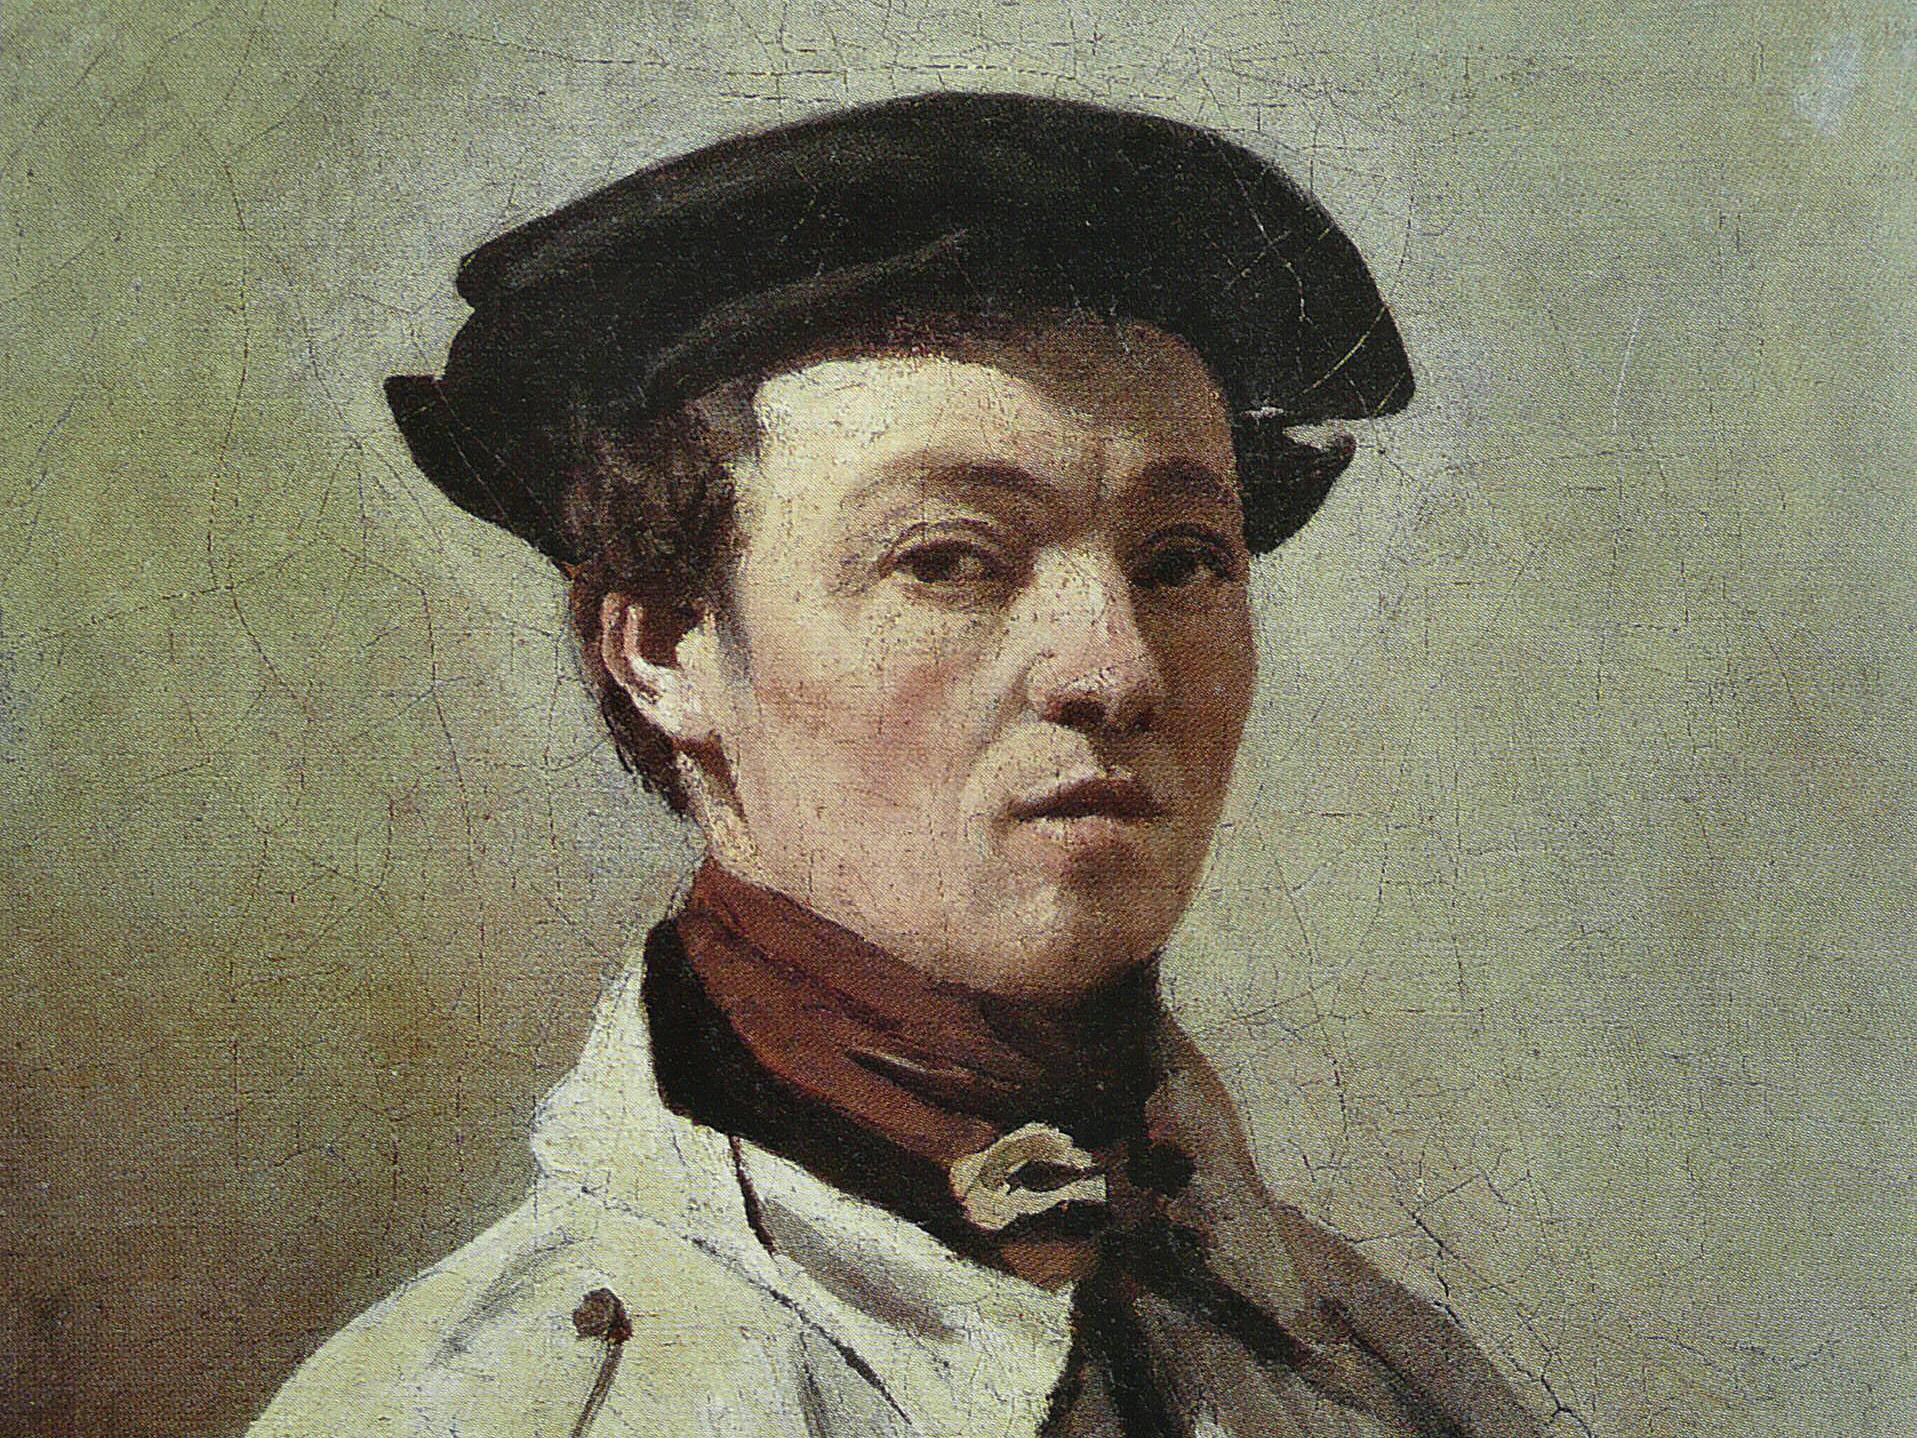 Jean-Baptiste Corot, « Autoportrait » ou « Corot, la palette à la main », image Wikipedia